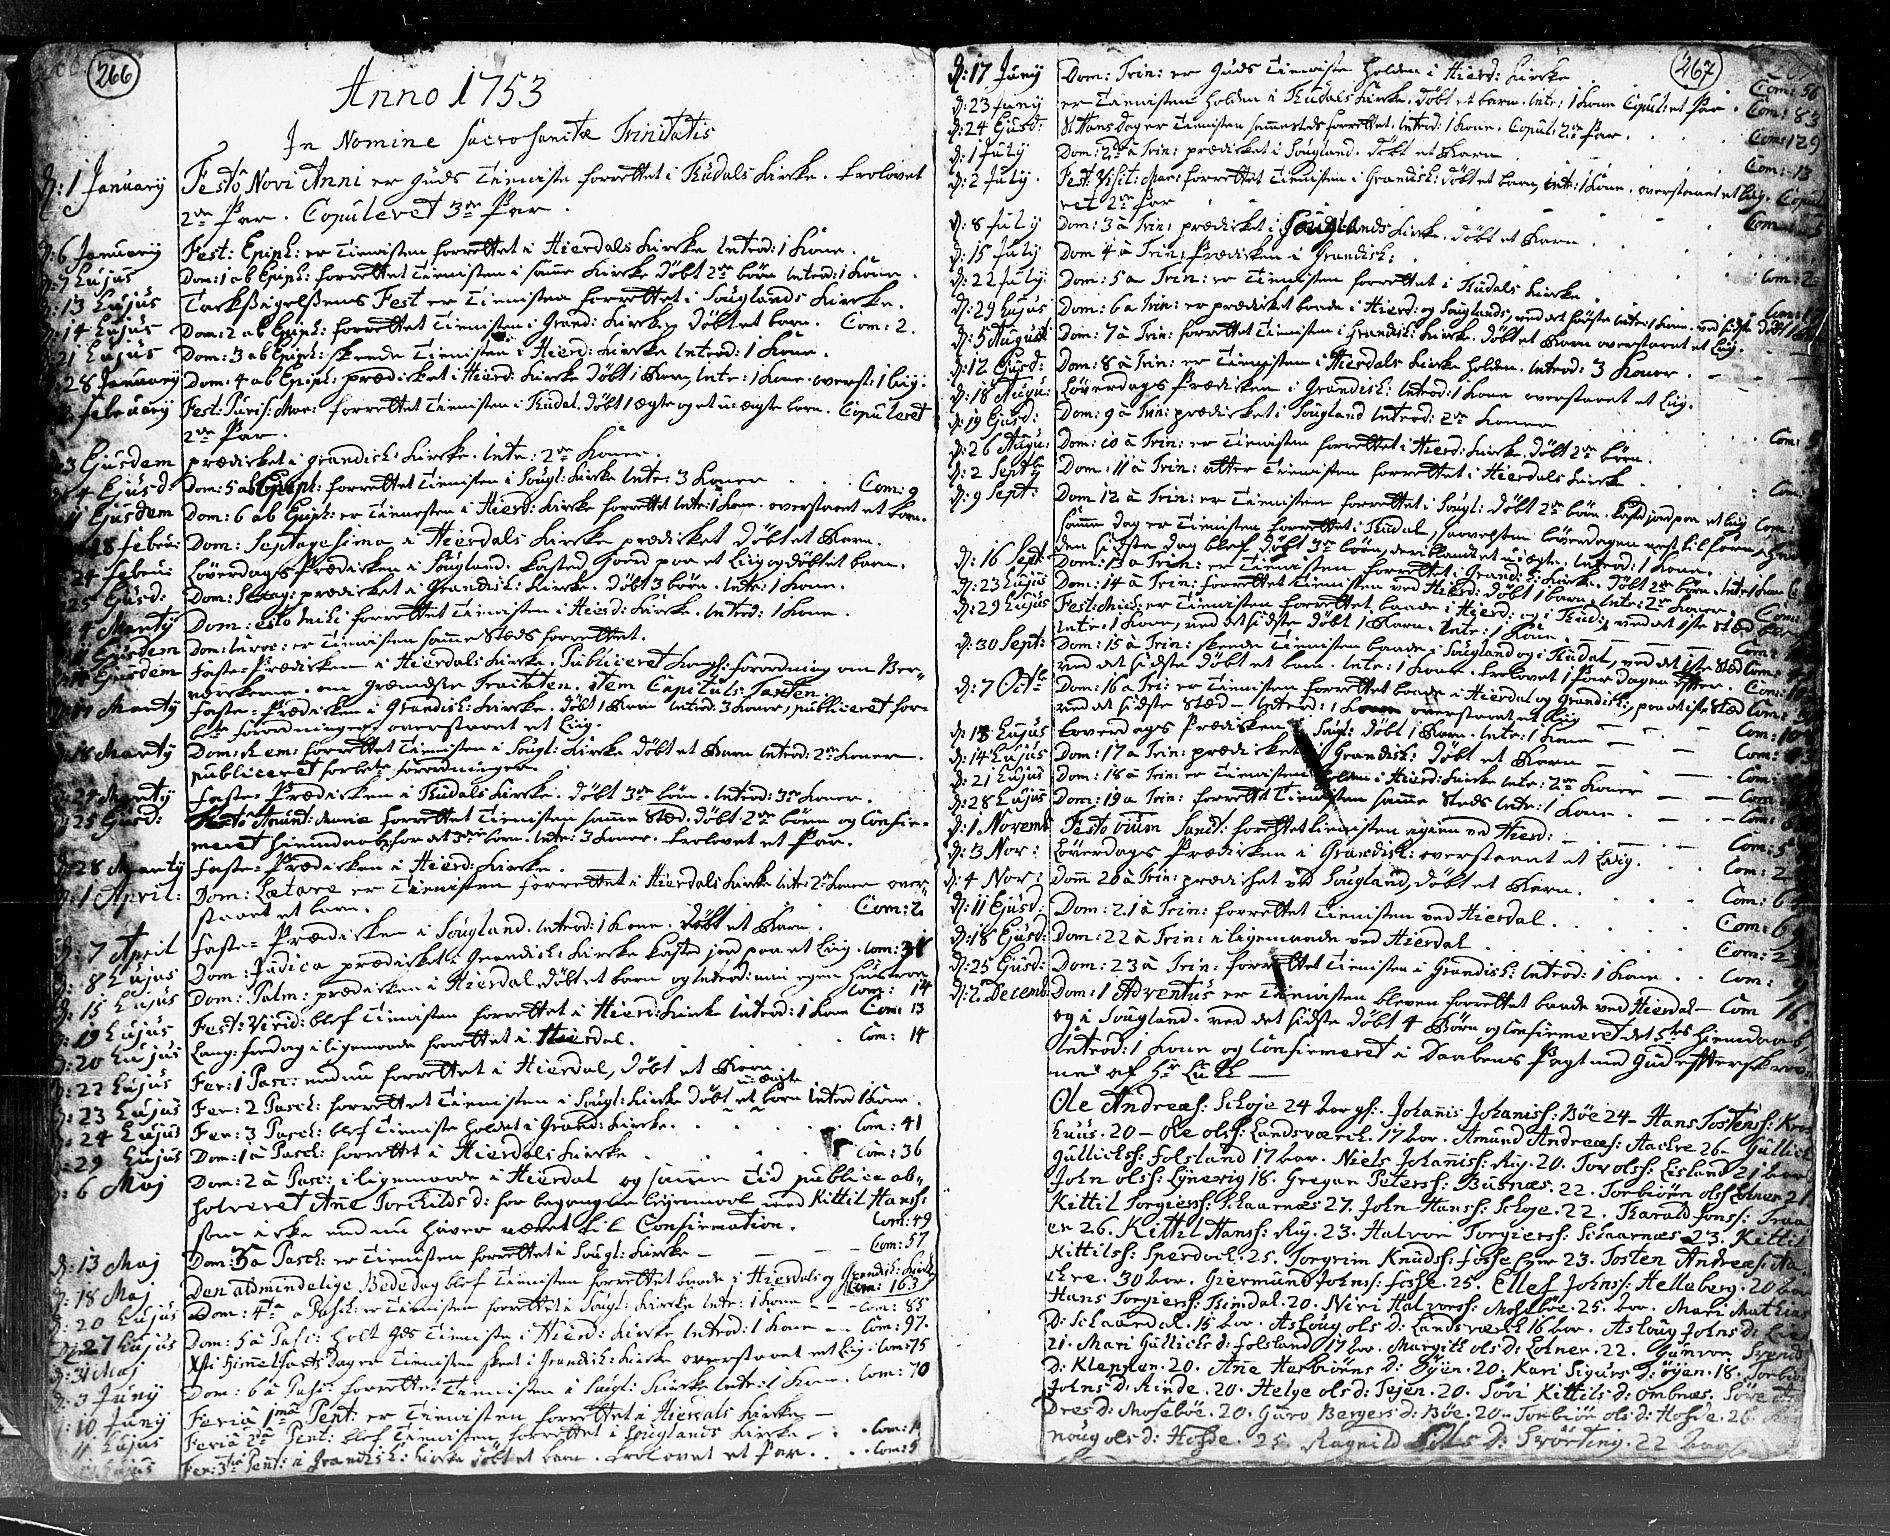 SAKO, Hjartdal kirkebøker, F/Fa/L0002: Ministerialbok nr. I 2, 1716-1754, s. 266-267